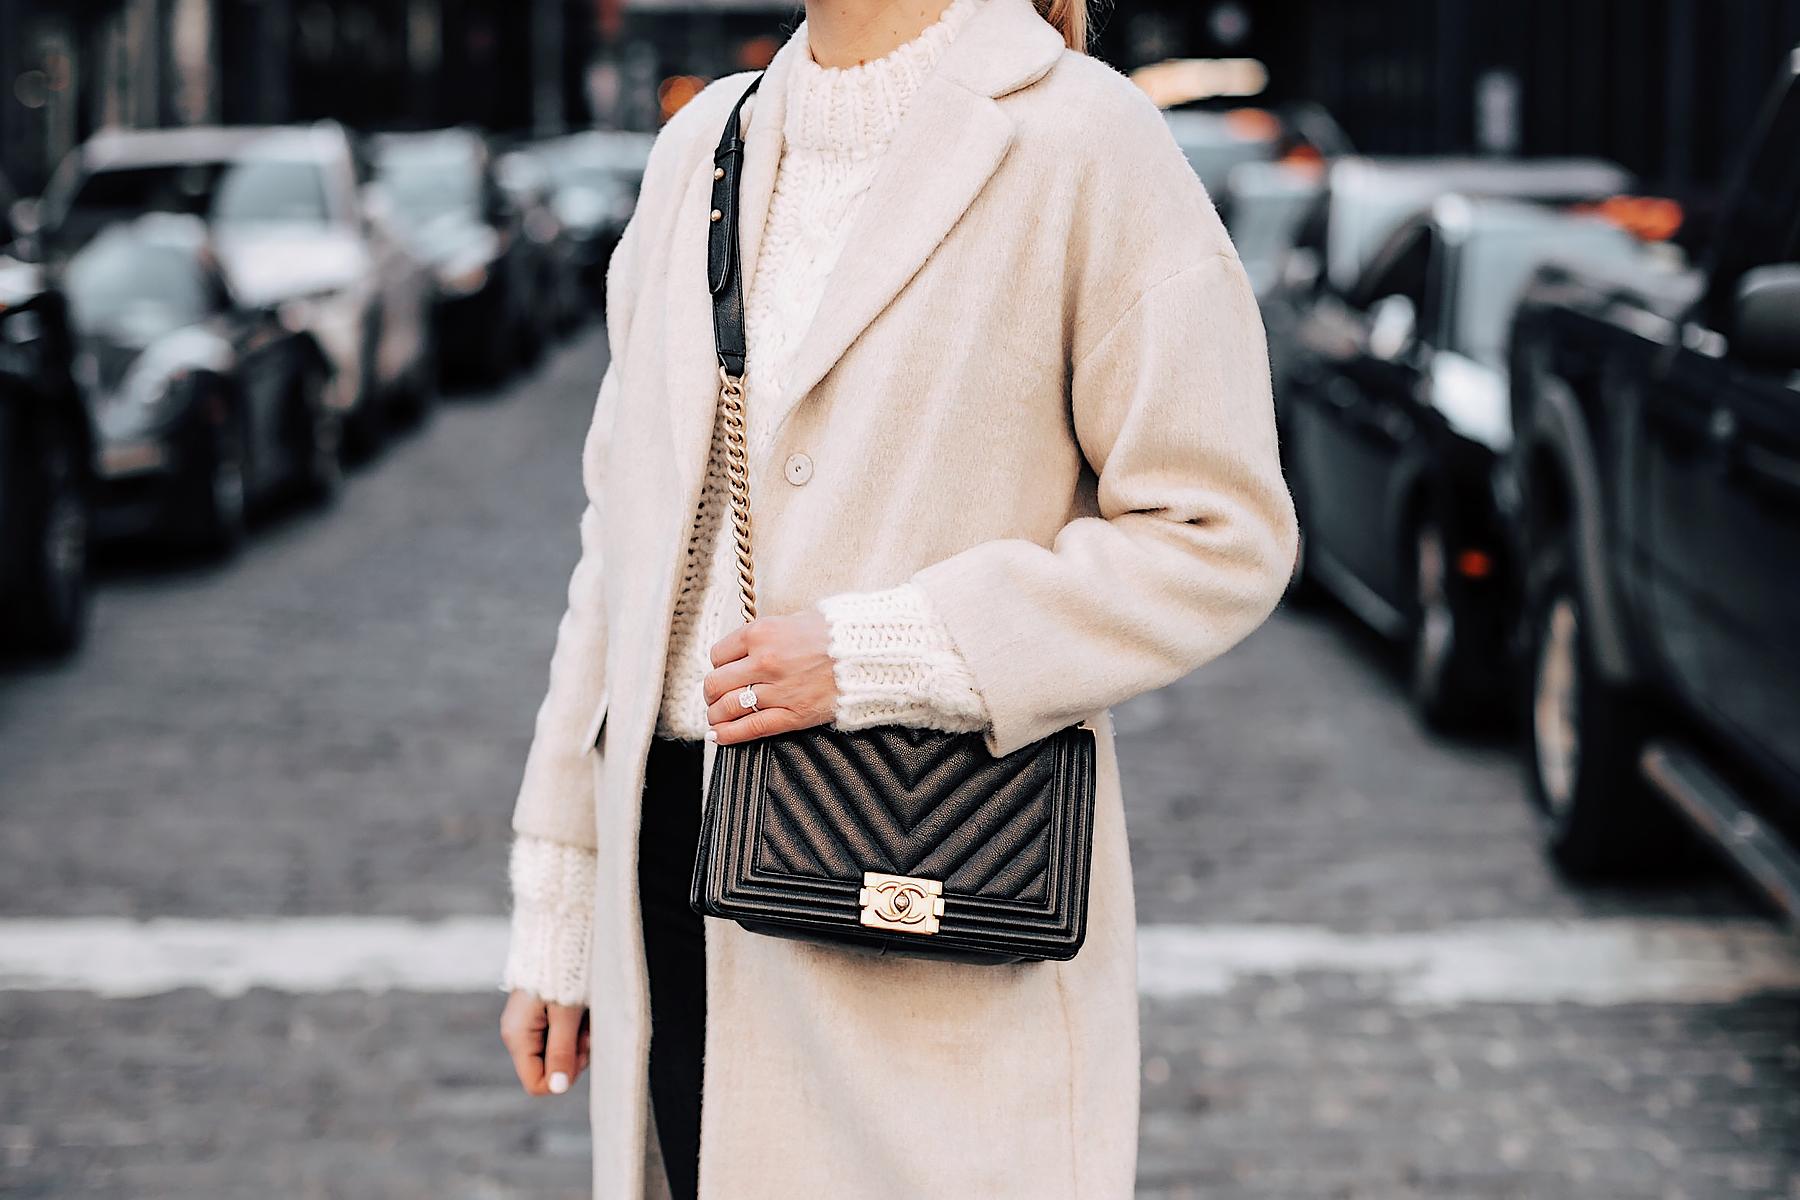 Blonde Woman Wearing Anine Bing White Knit Sweater Beige Wool Coat Chanel Black Boy Bag Fashion Jackson Fashion Blogger NYFW Street Style